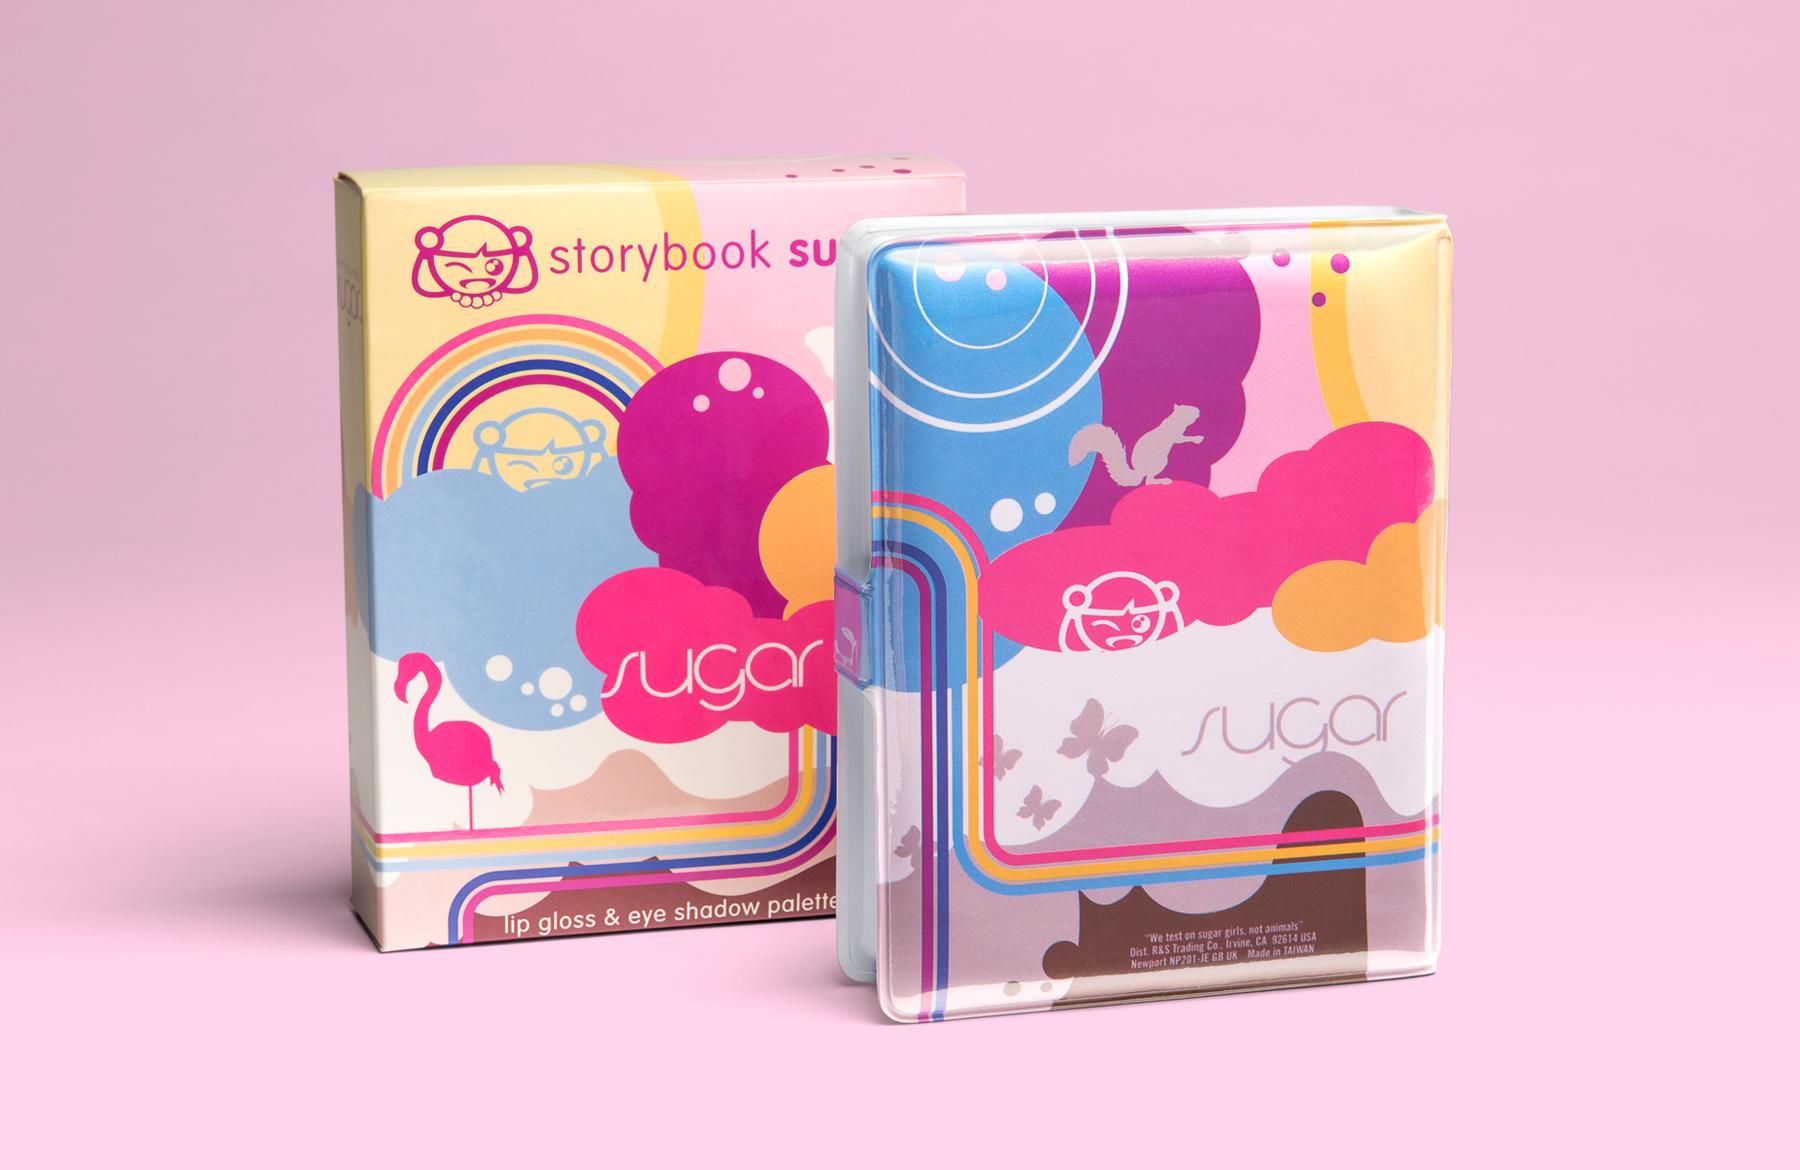 sugar storybook